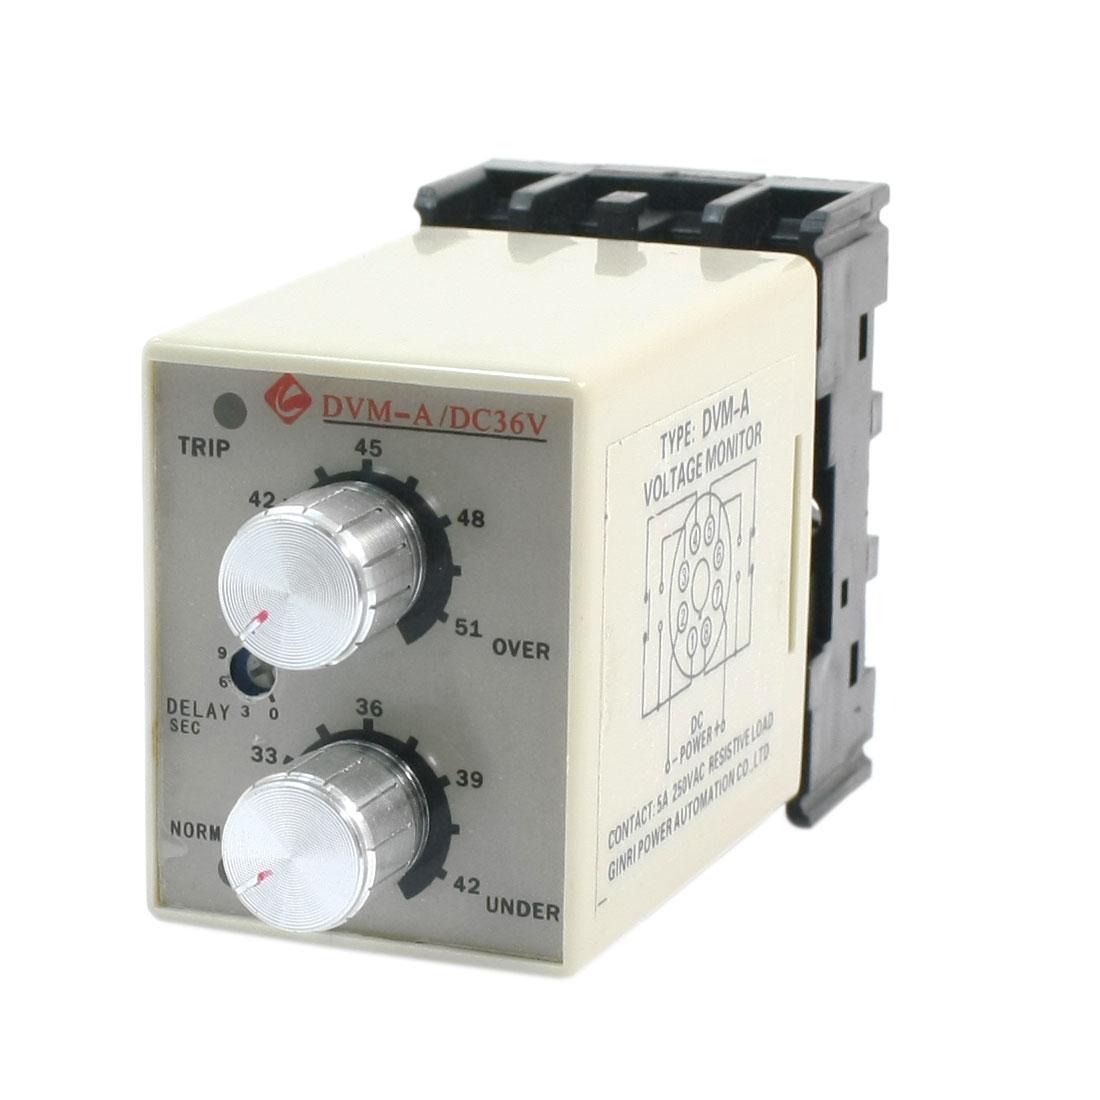 DVM-A/36V DC 36V Tow LED Indicator 35mm Rail Mounting Adjustable Over/Under Voltage Volt Monitor Relay